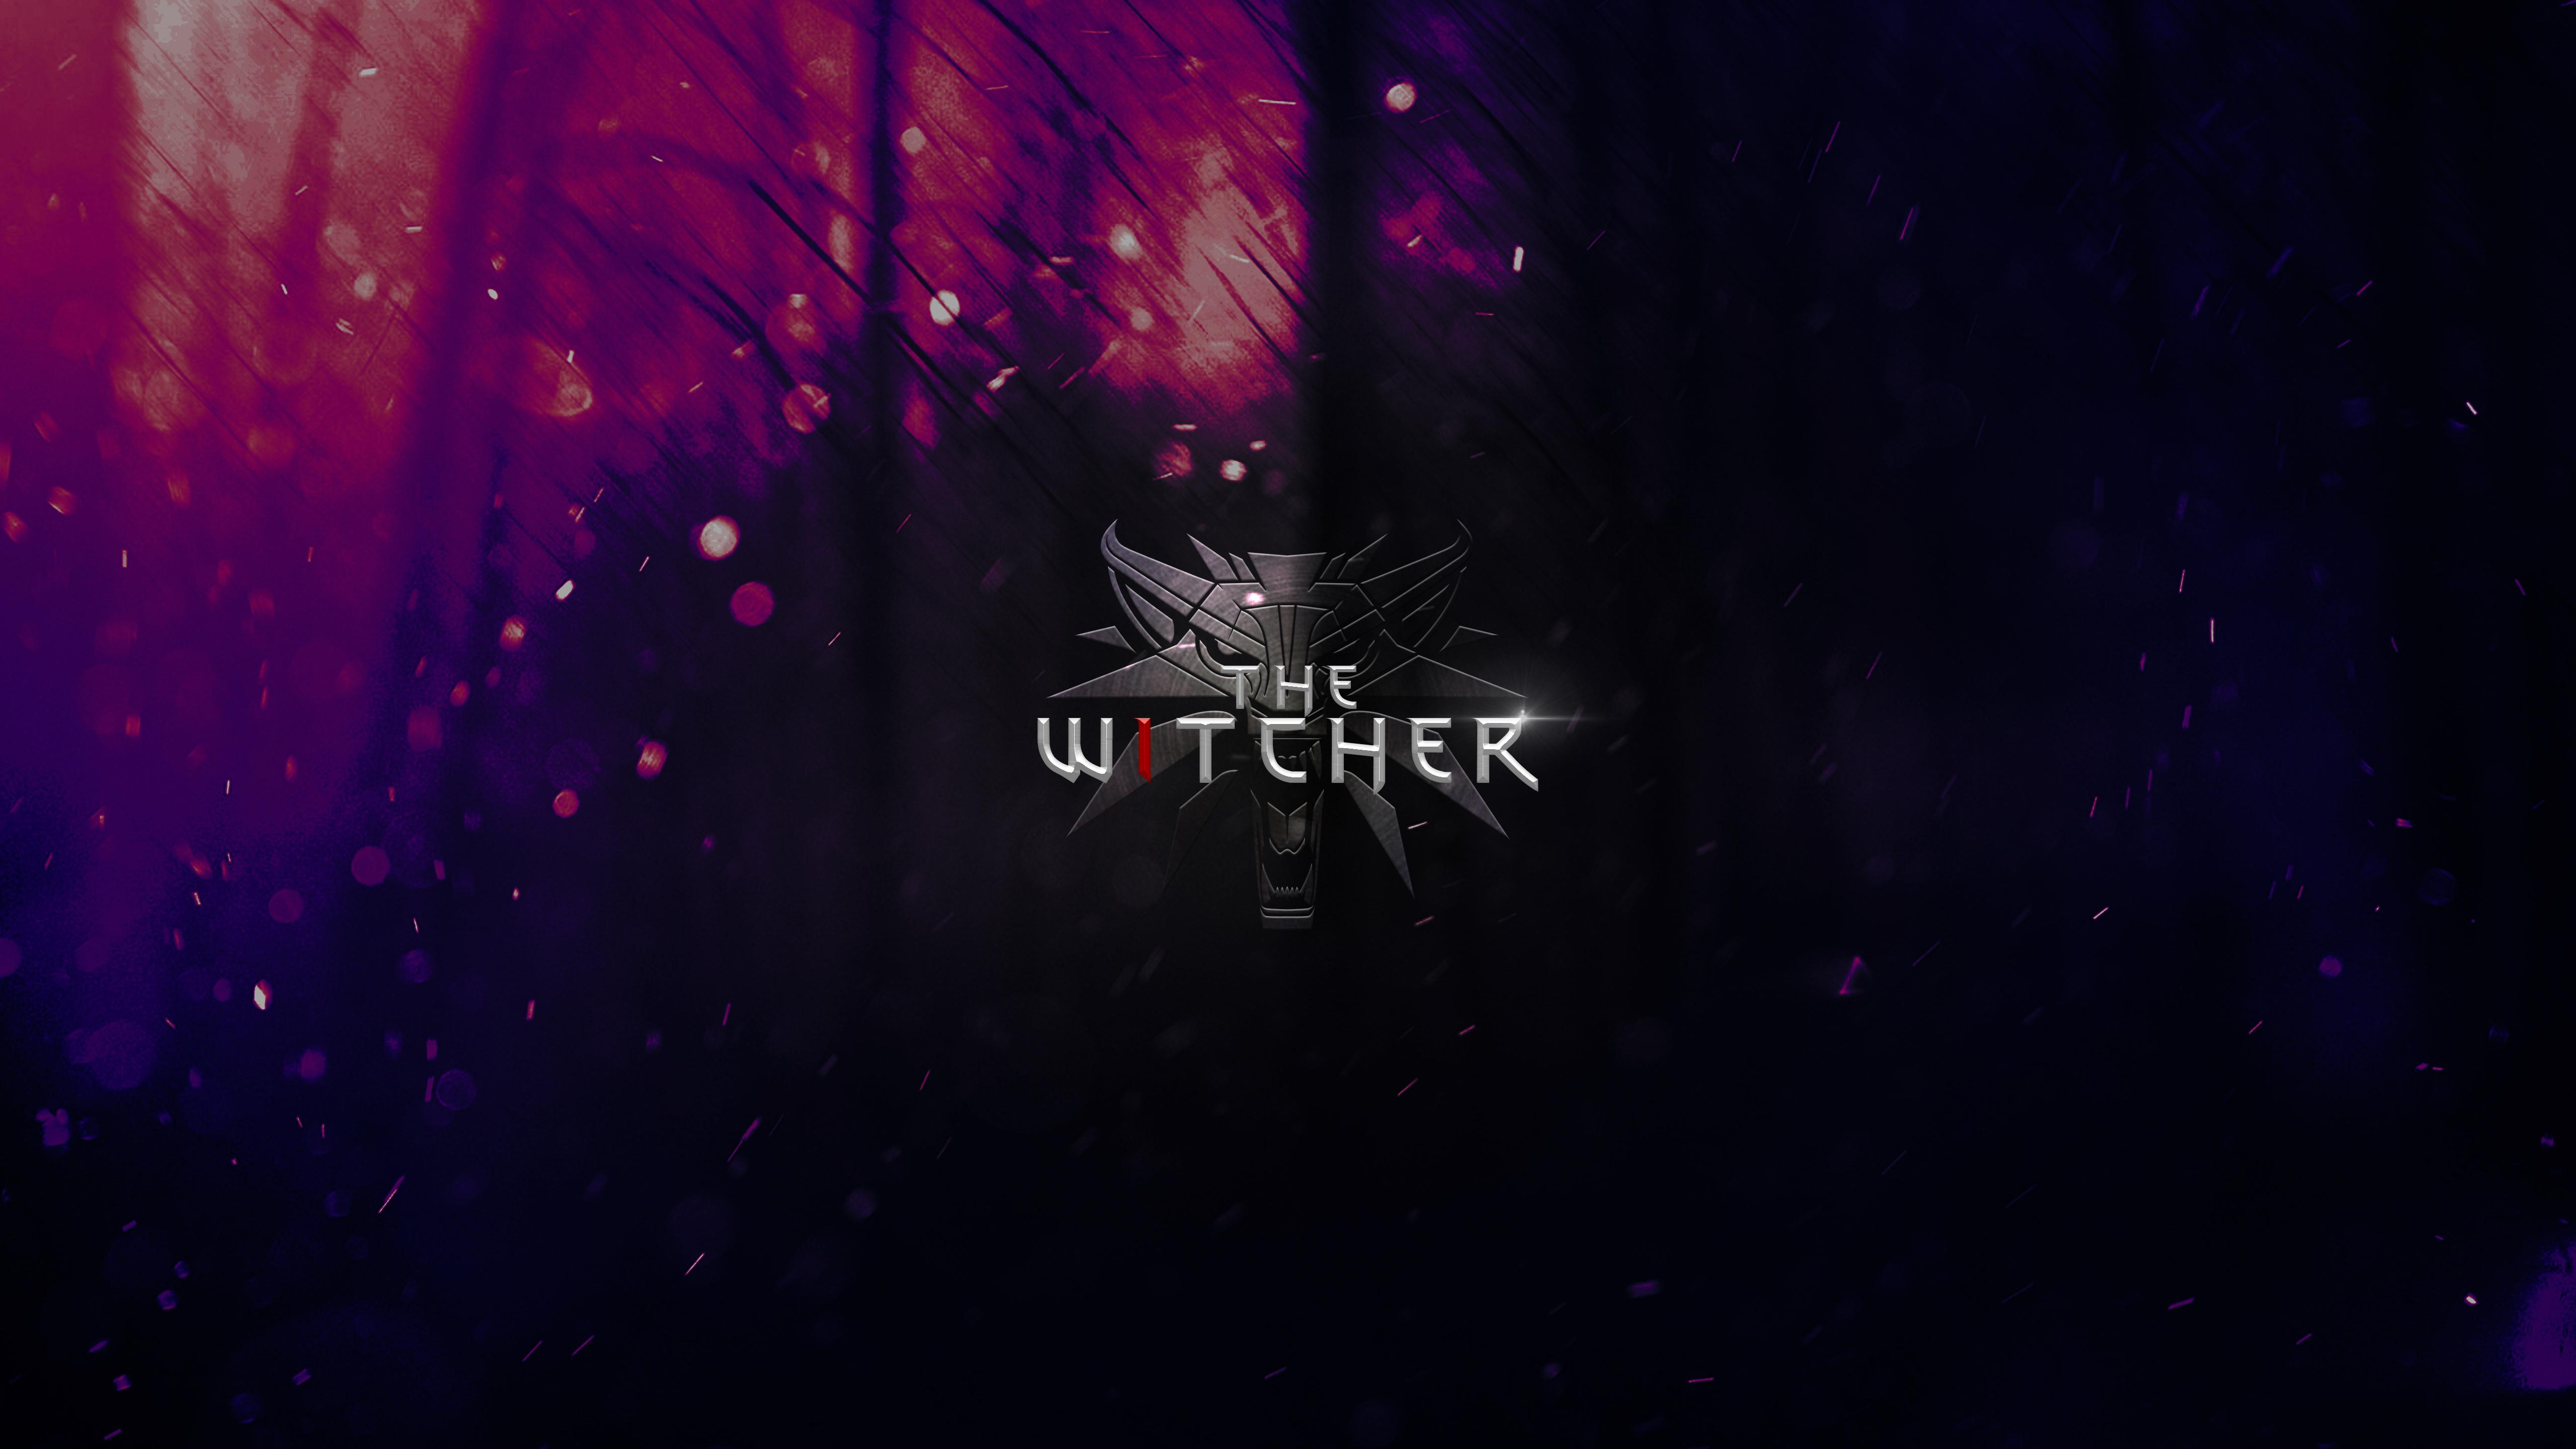 the-witcher-tv-show-5k-hw.jpg